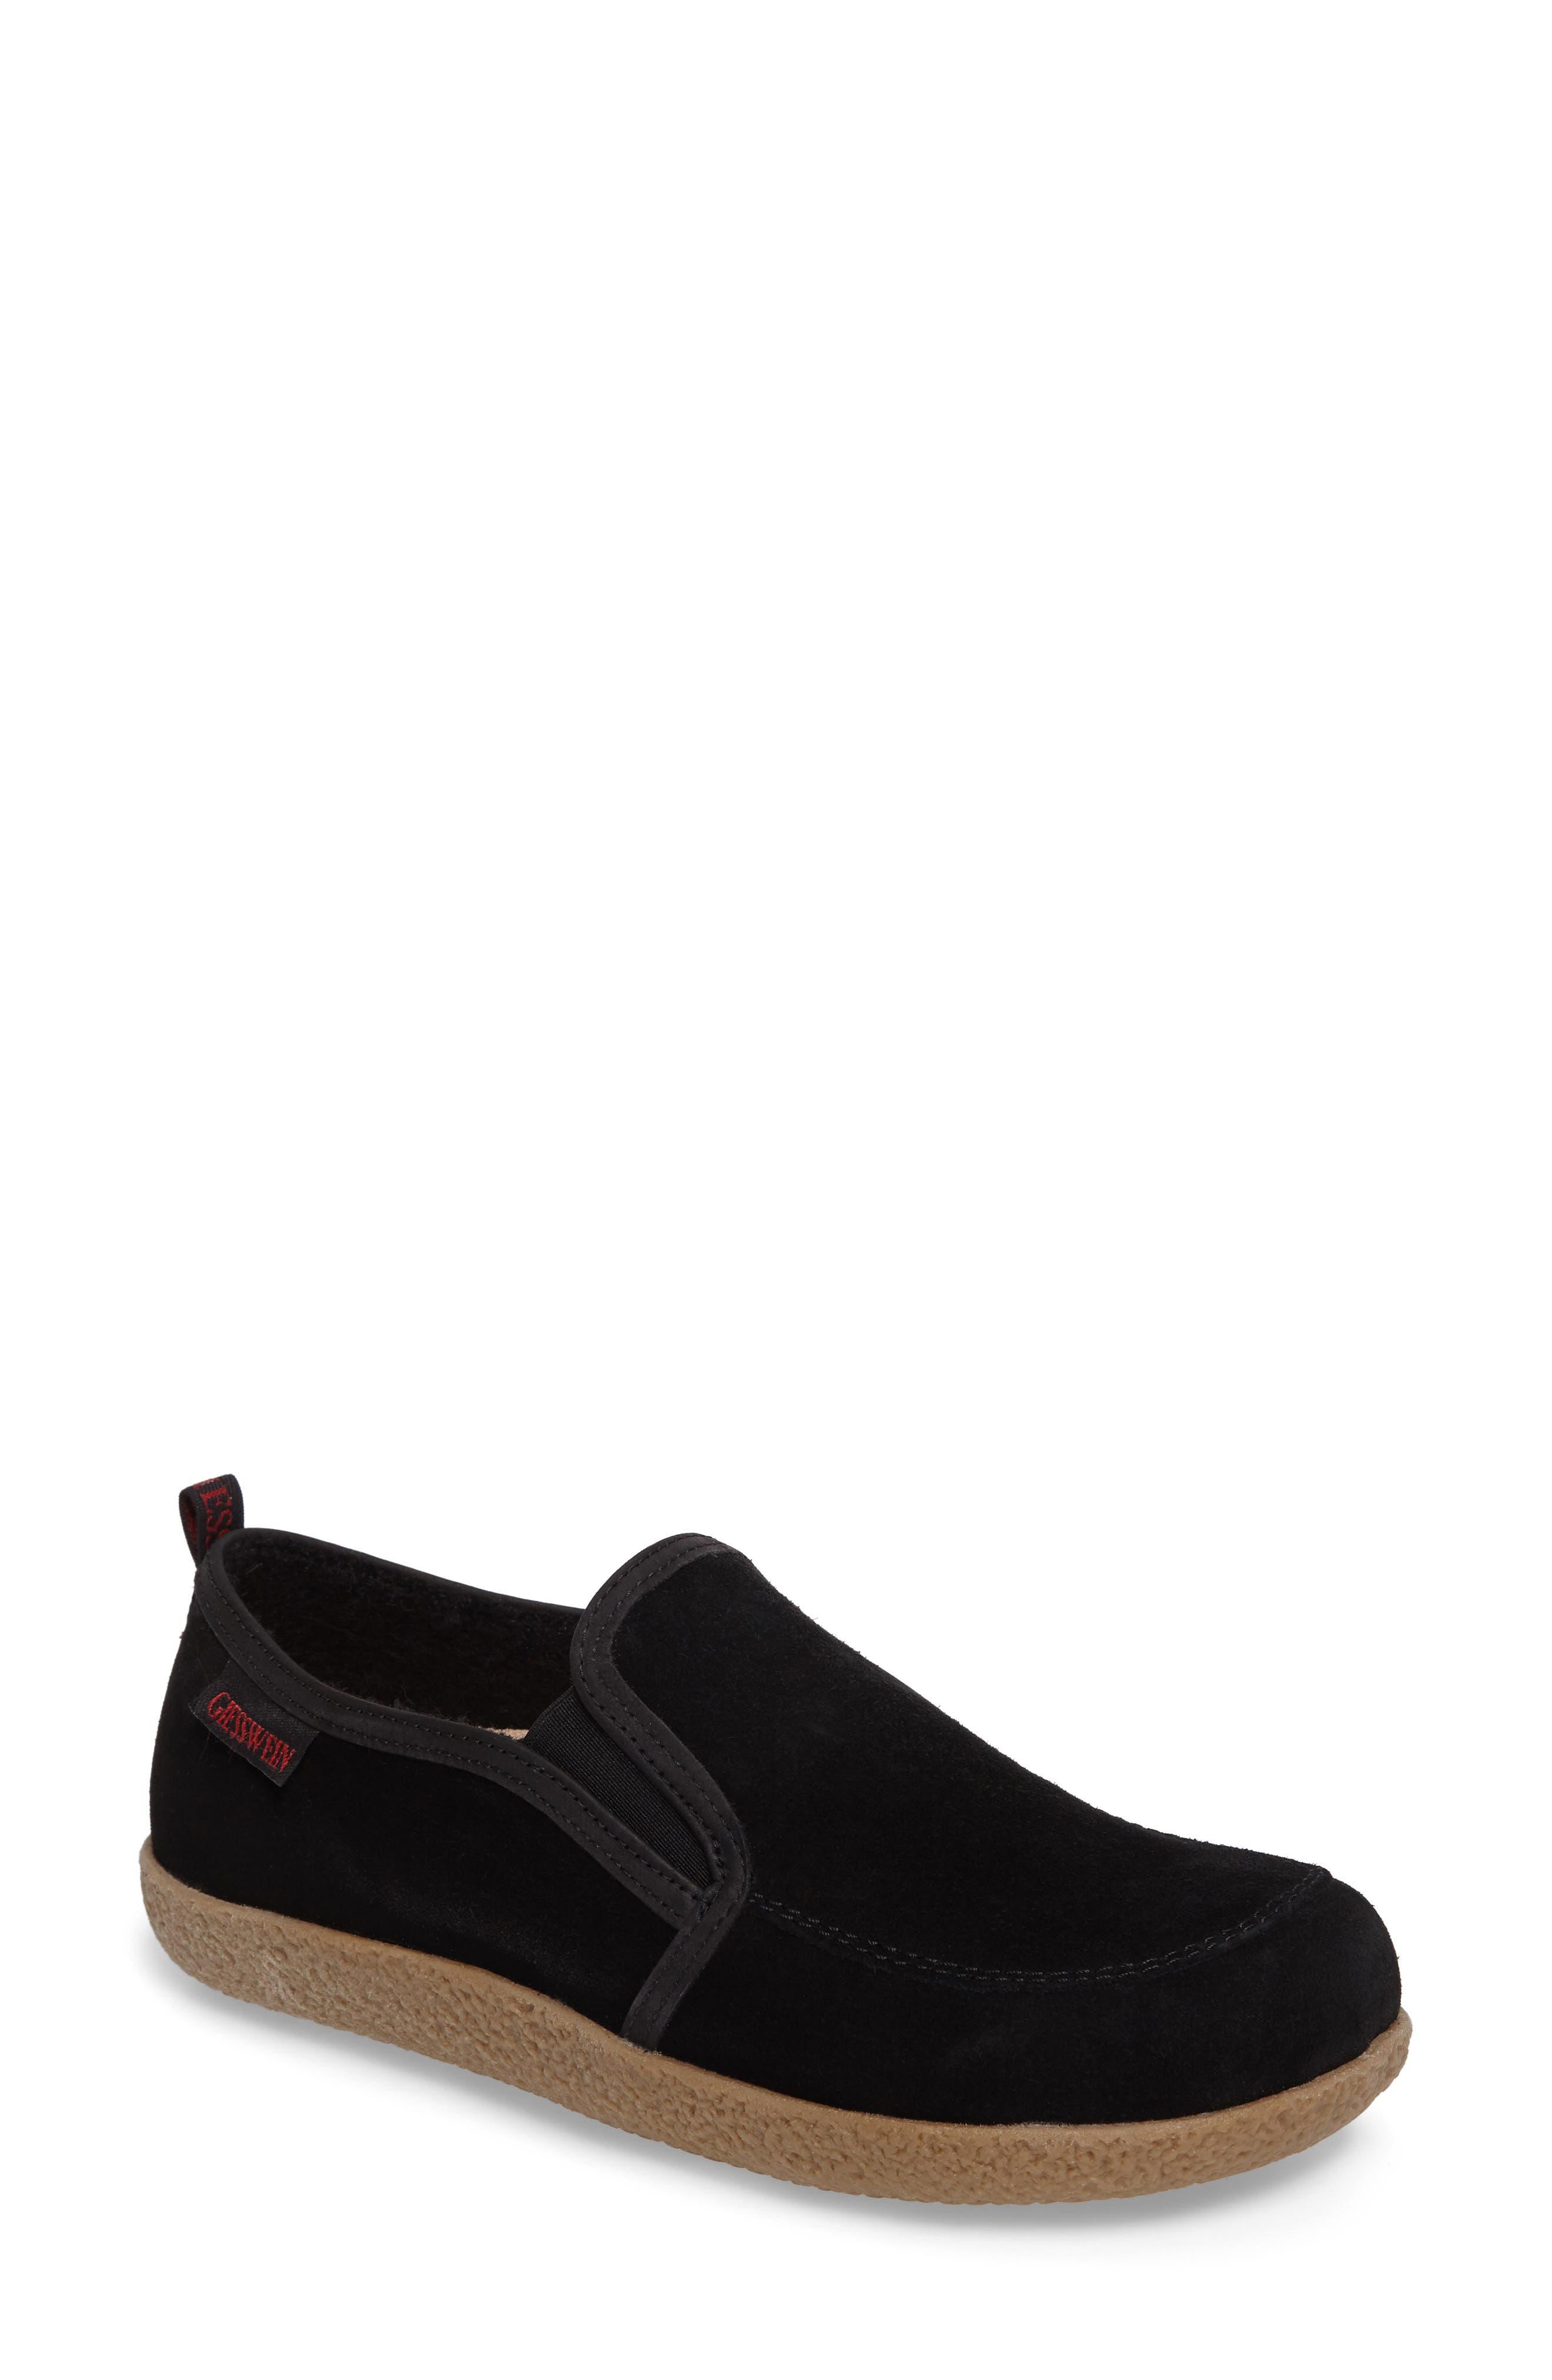 Alpen Loafer,                             Main thumbnail 1, color,                             Black Wool